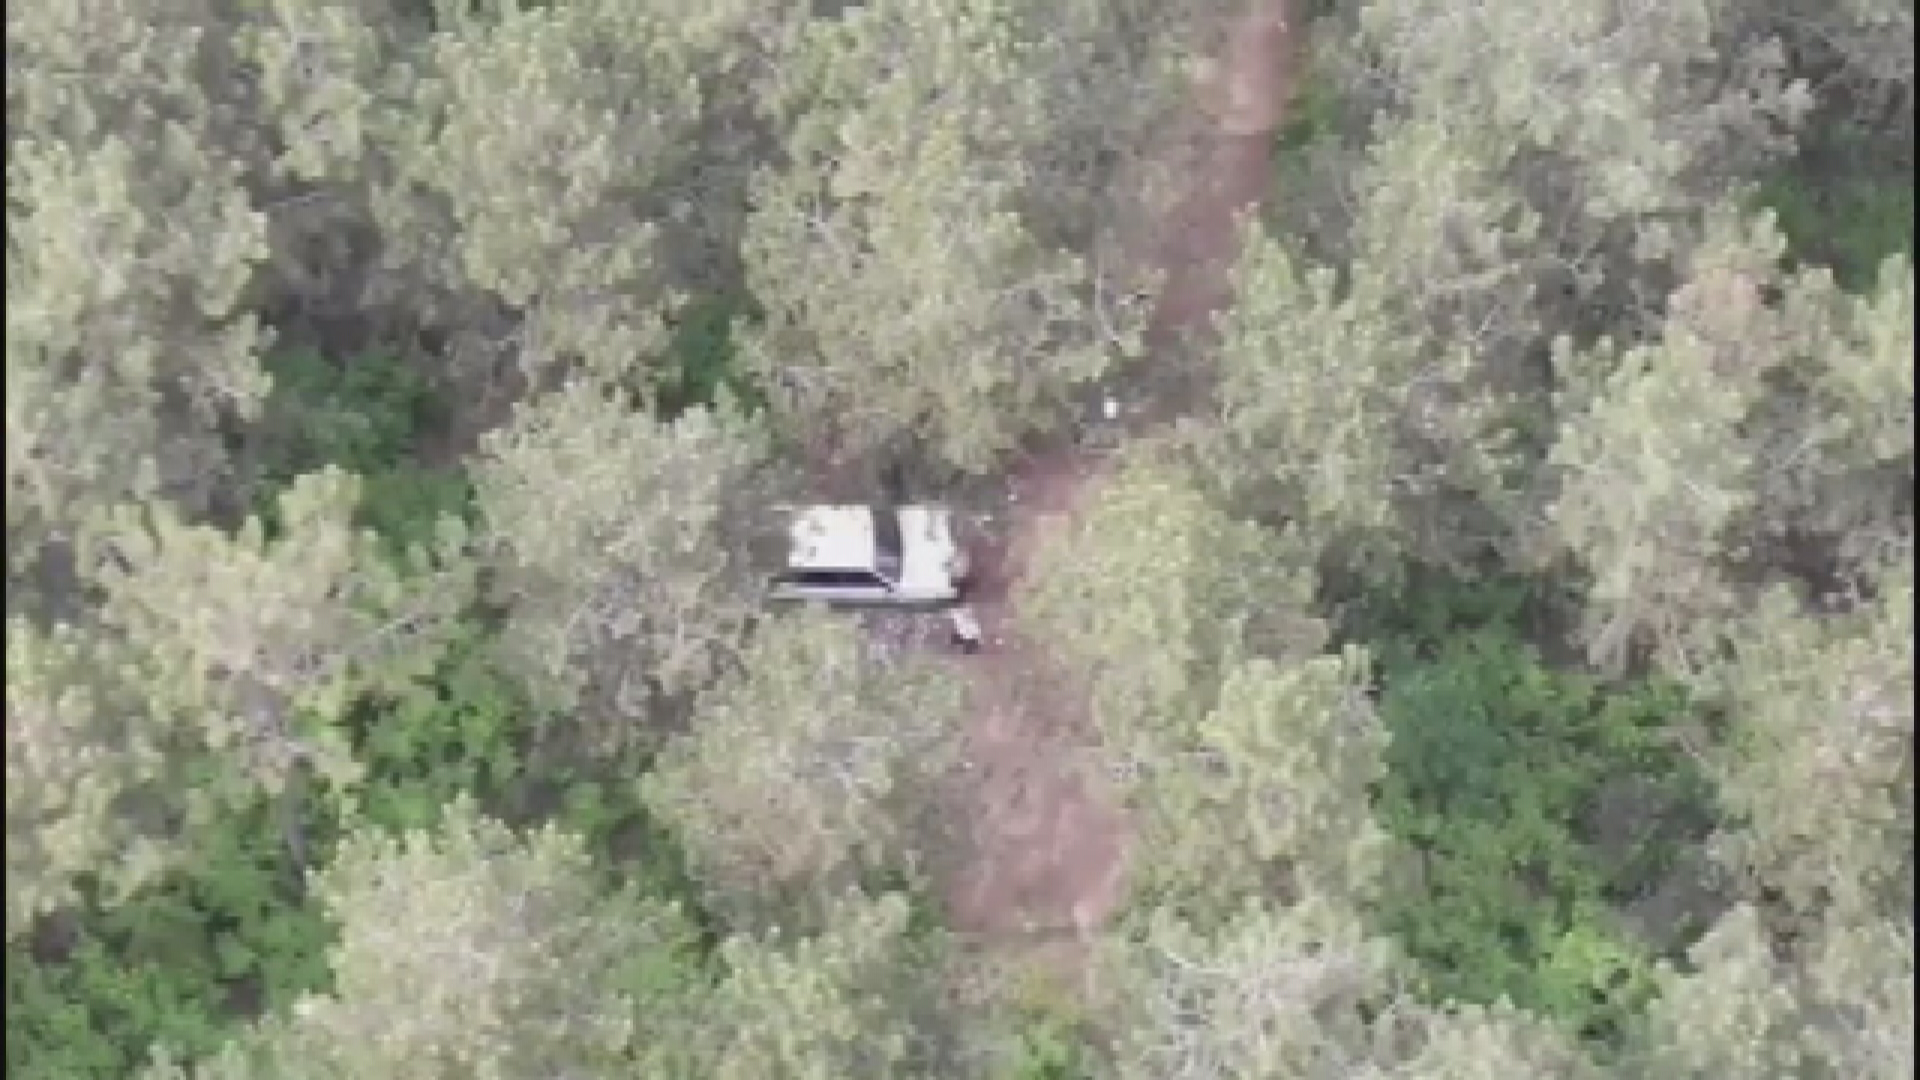 sultanbeylide-ormanda-piknik-yapan-2-kisi-drone-ile-tespit-edildi-1950-dhaphoto3.jpg